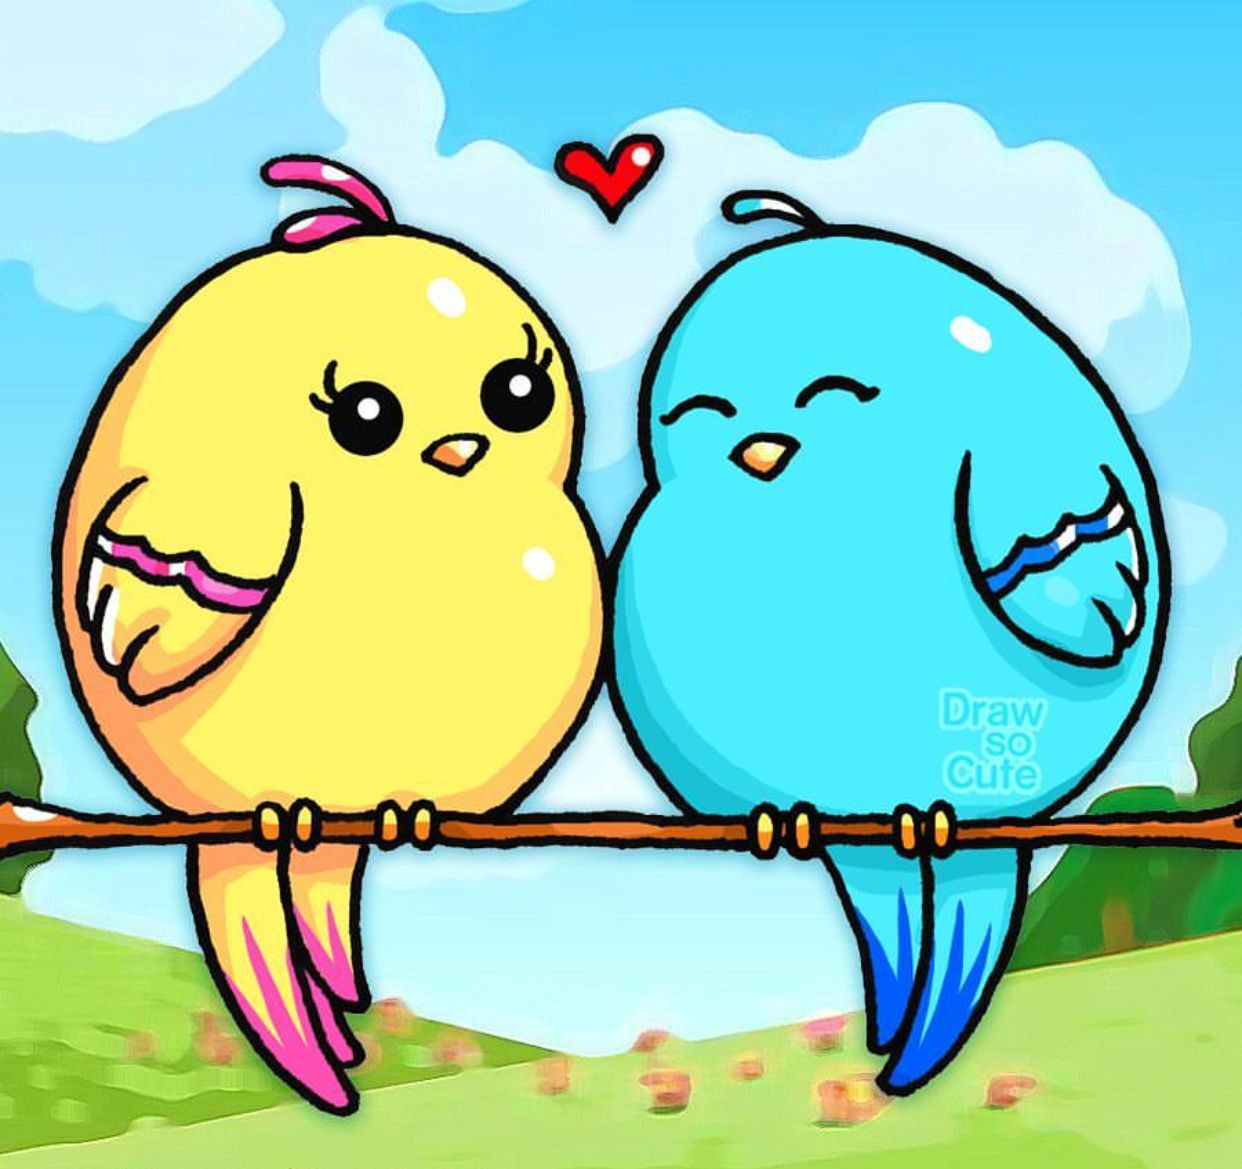 Aw Lovebirds Draw So Cute Drawing Ideas Pinterest Cute